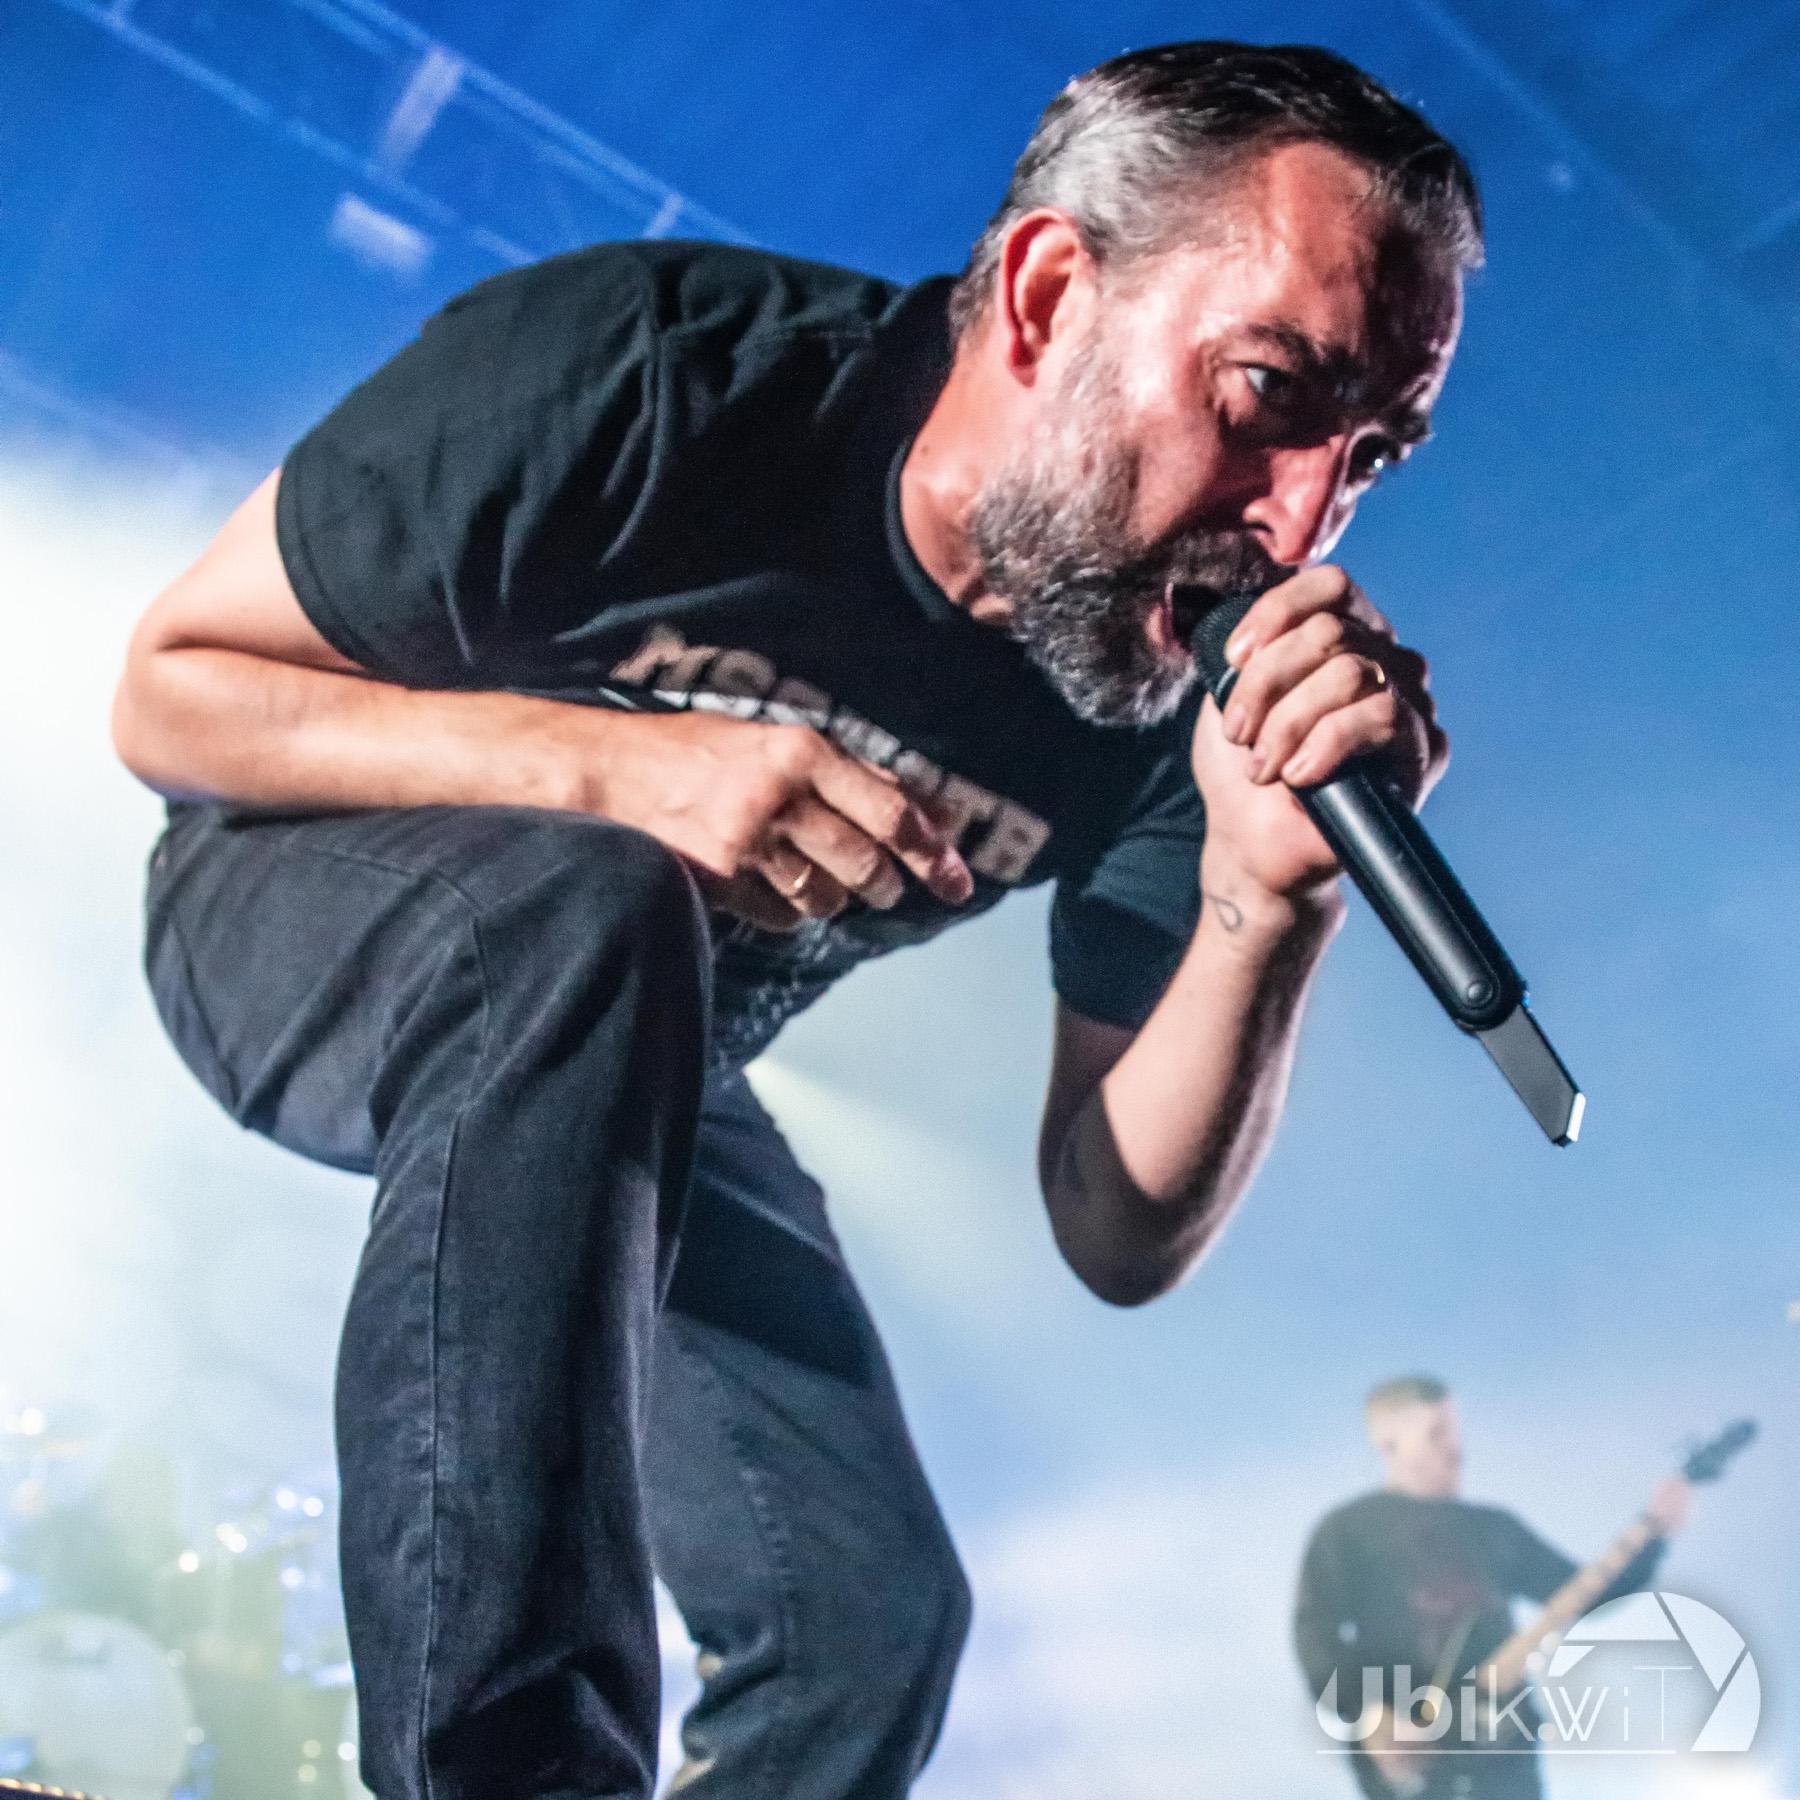 Mass Hysteria + Redemption @ Lille 05 octobre 2019